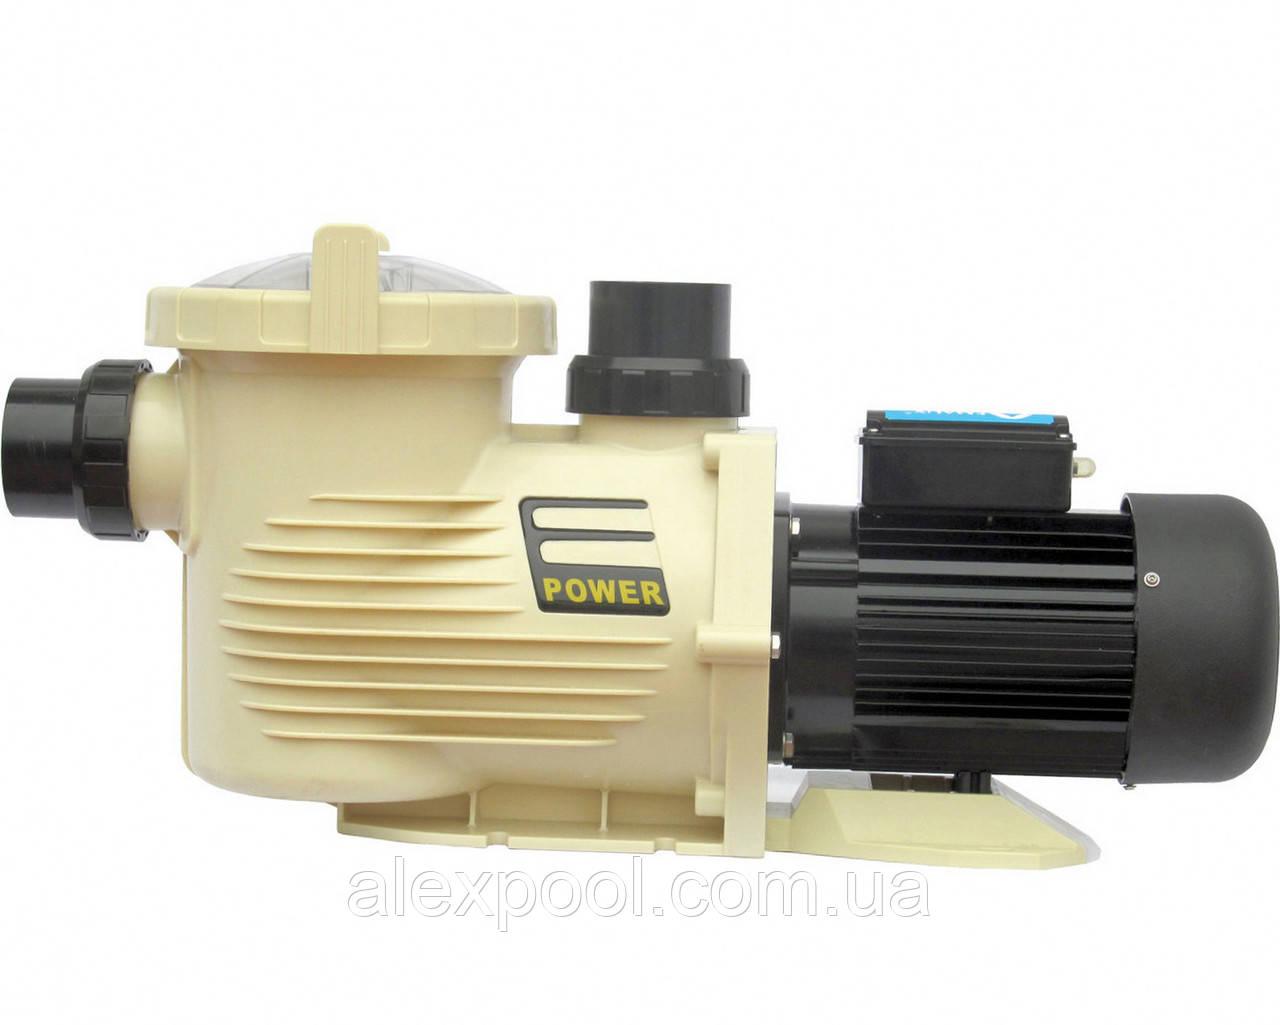 Emaux EPH400 Насос для бассейна (EPH 400, 33 м. куб/час, 2,6 кВт, 4 HP, 380В)